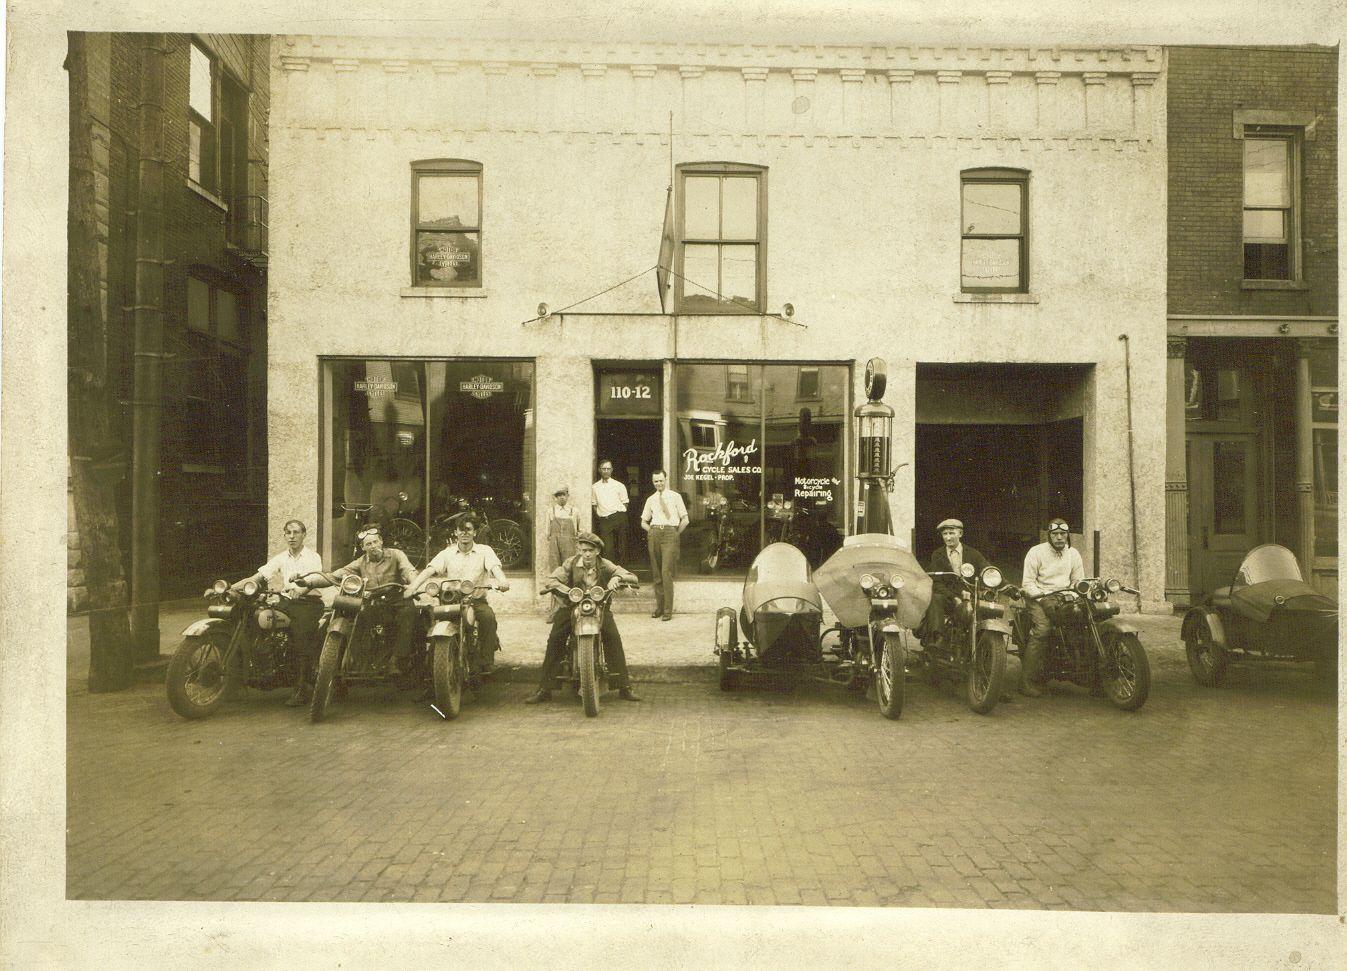 kegel harley davidson in rockford il on madison st circa 1930s